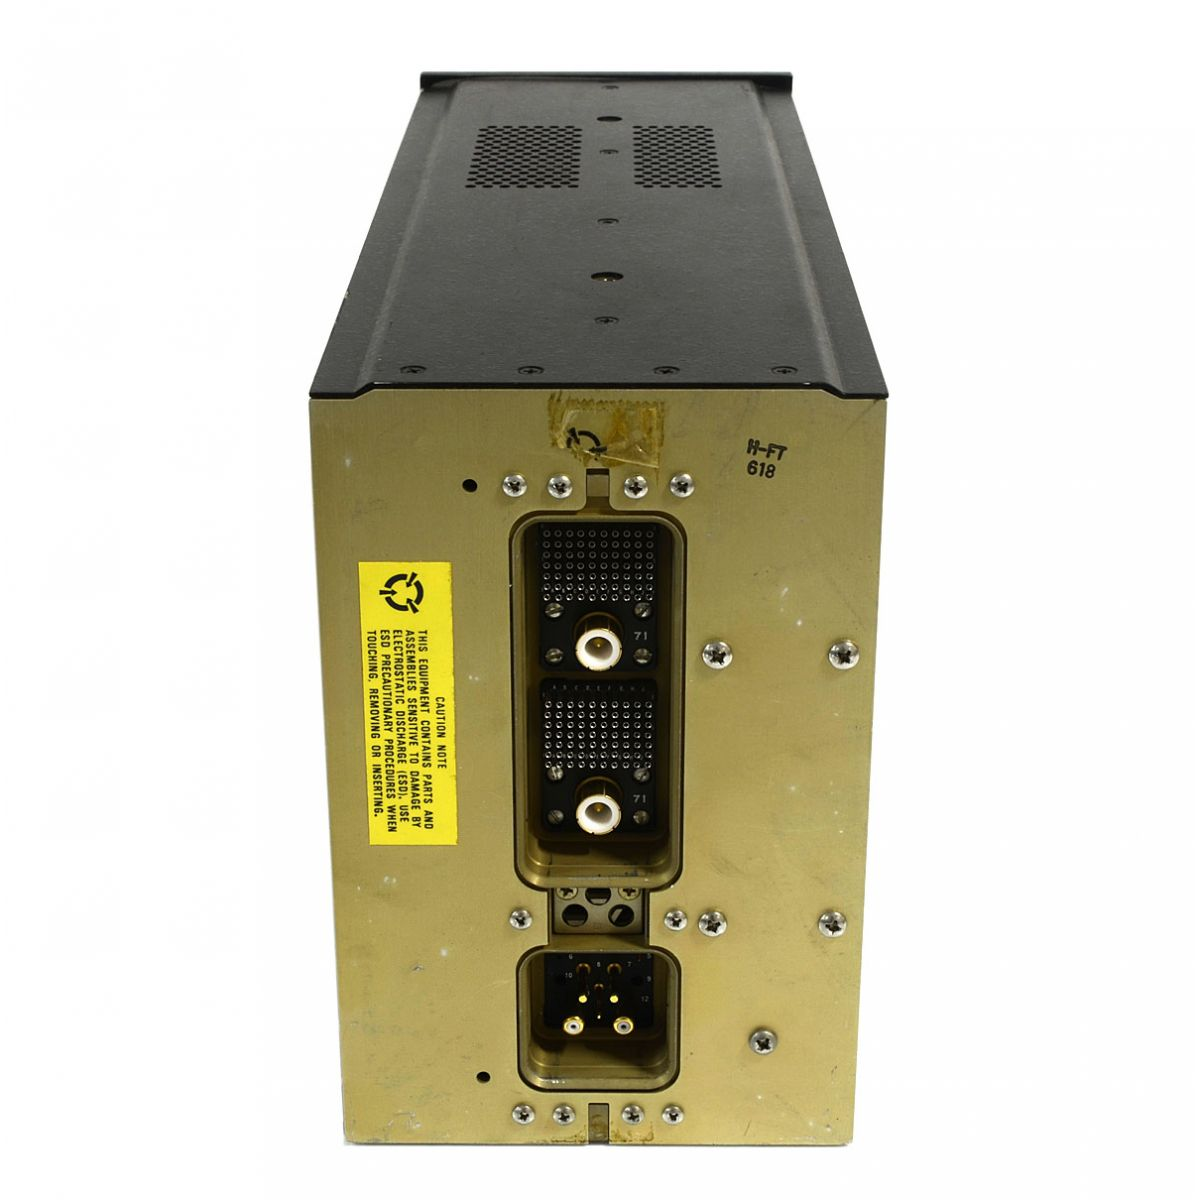 Transponder Mode S Honeywell TRA-67A ATC PN: 066-01127-1601